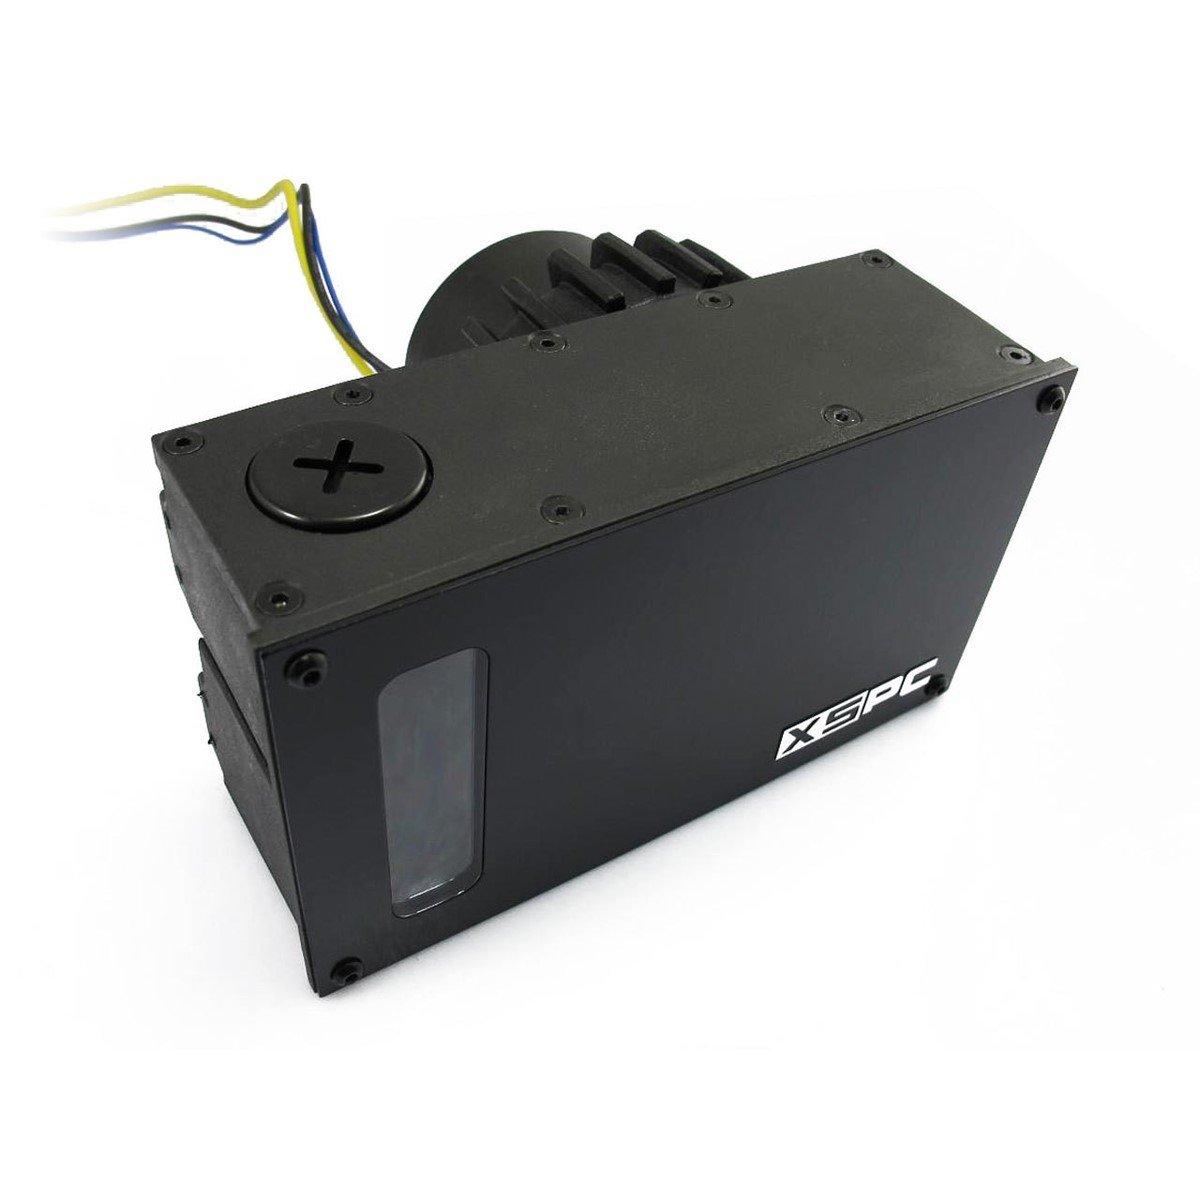 XSPC D5 Dual Bay Reservoir/Pump Combo V2 (SATA Power)